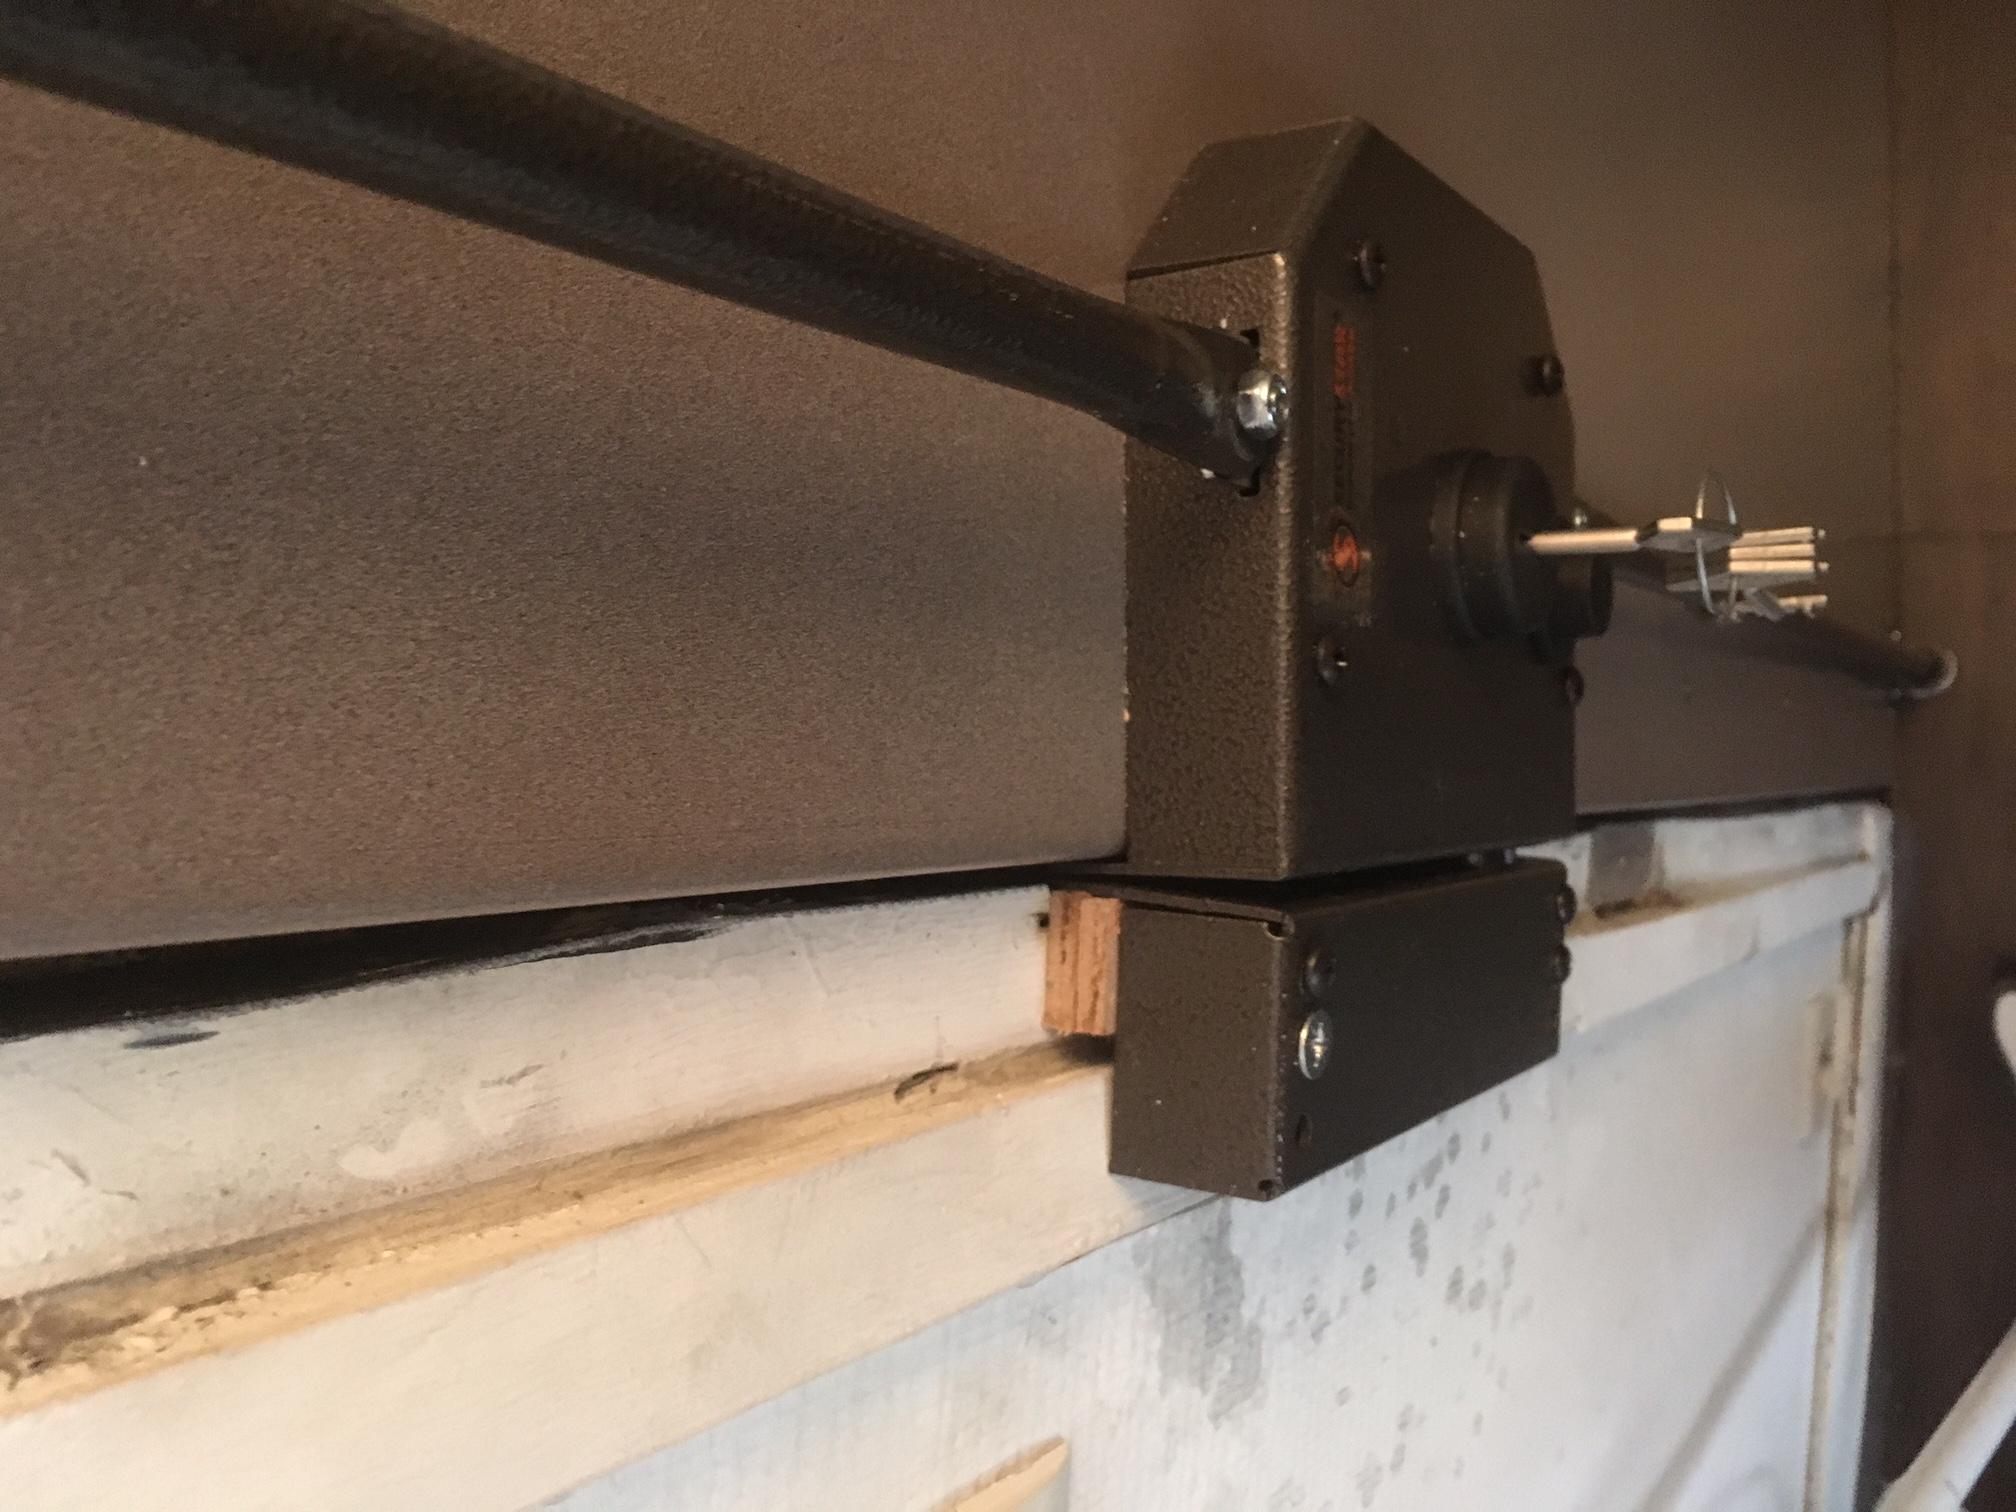 Barre de pivot et bloc serrure